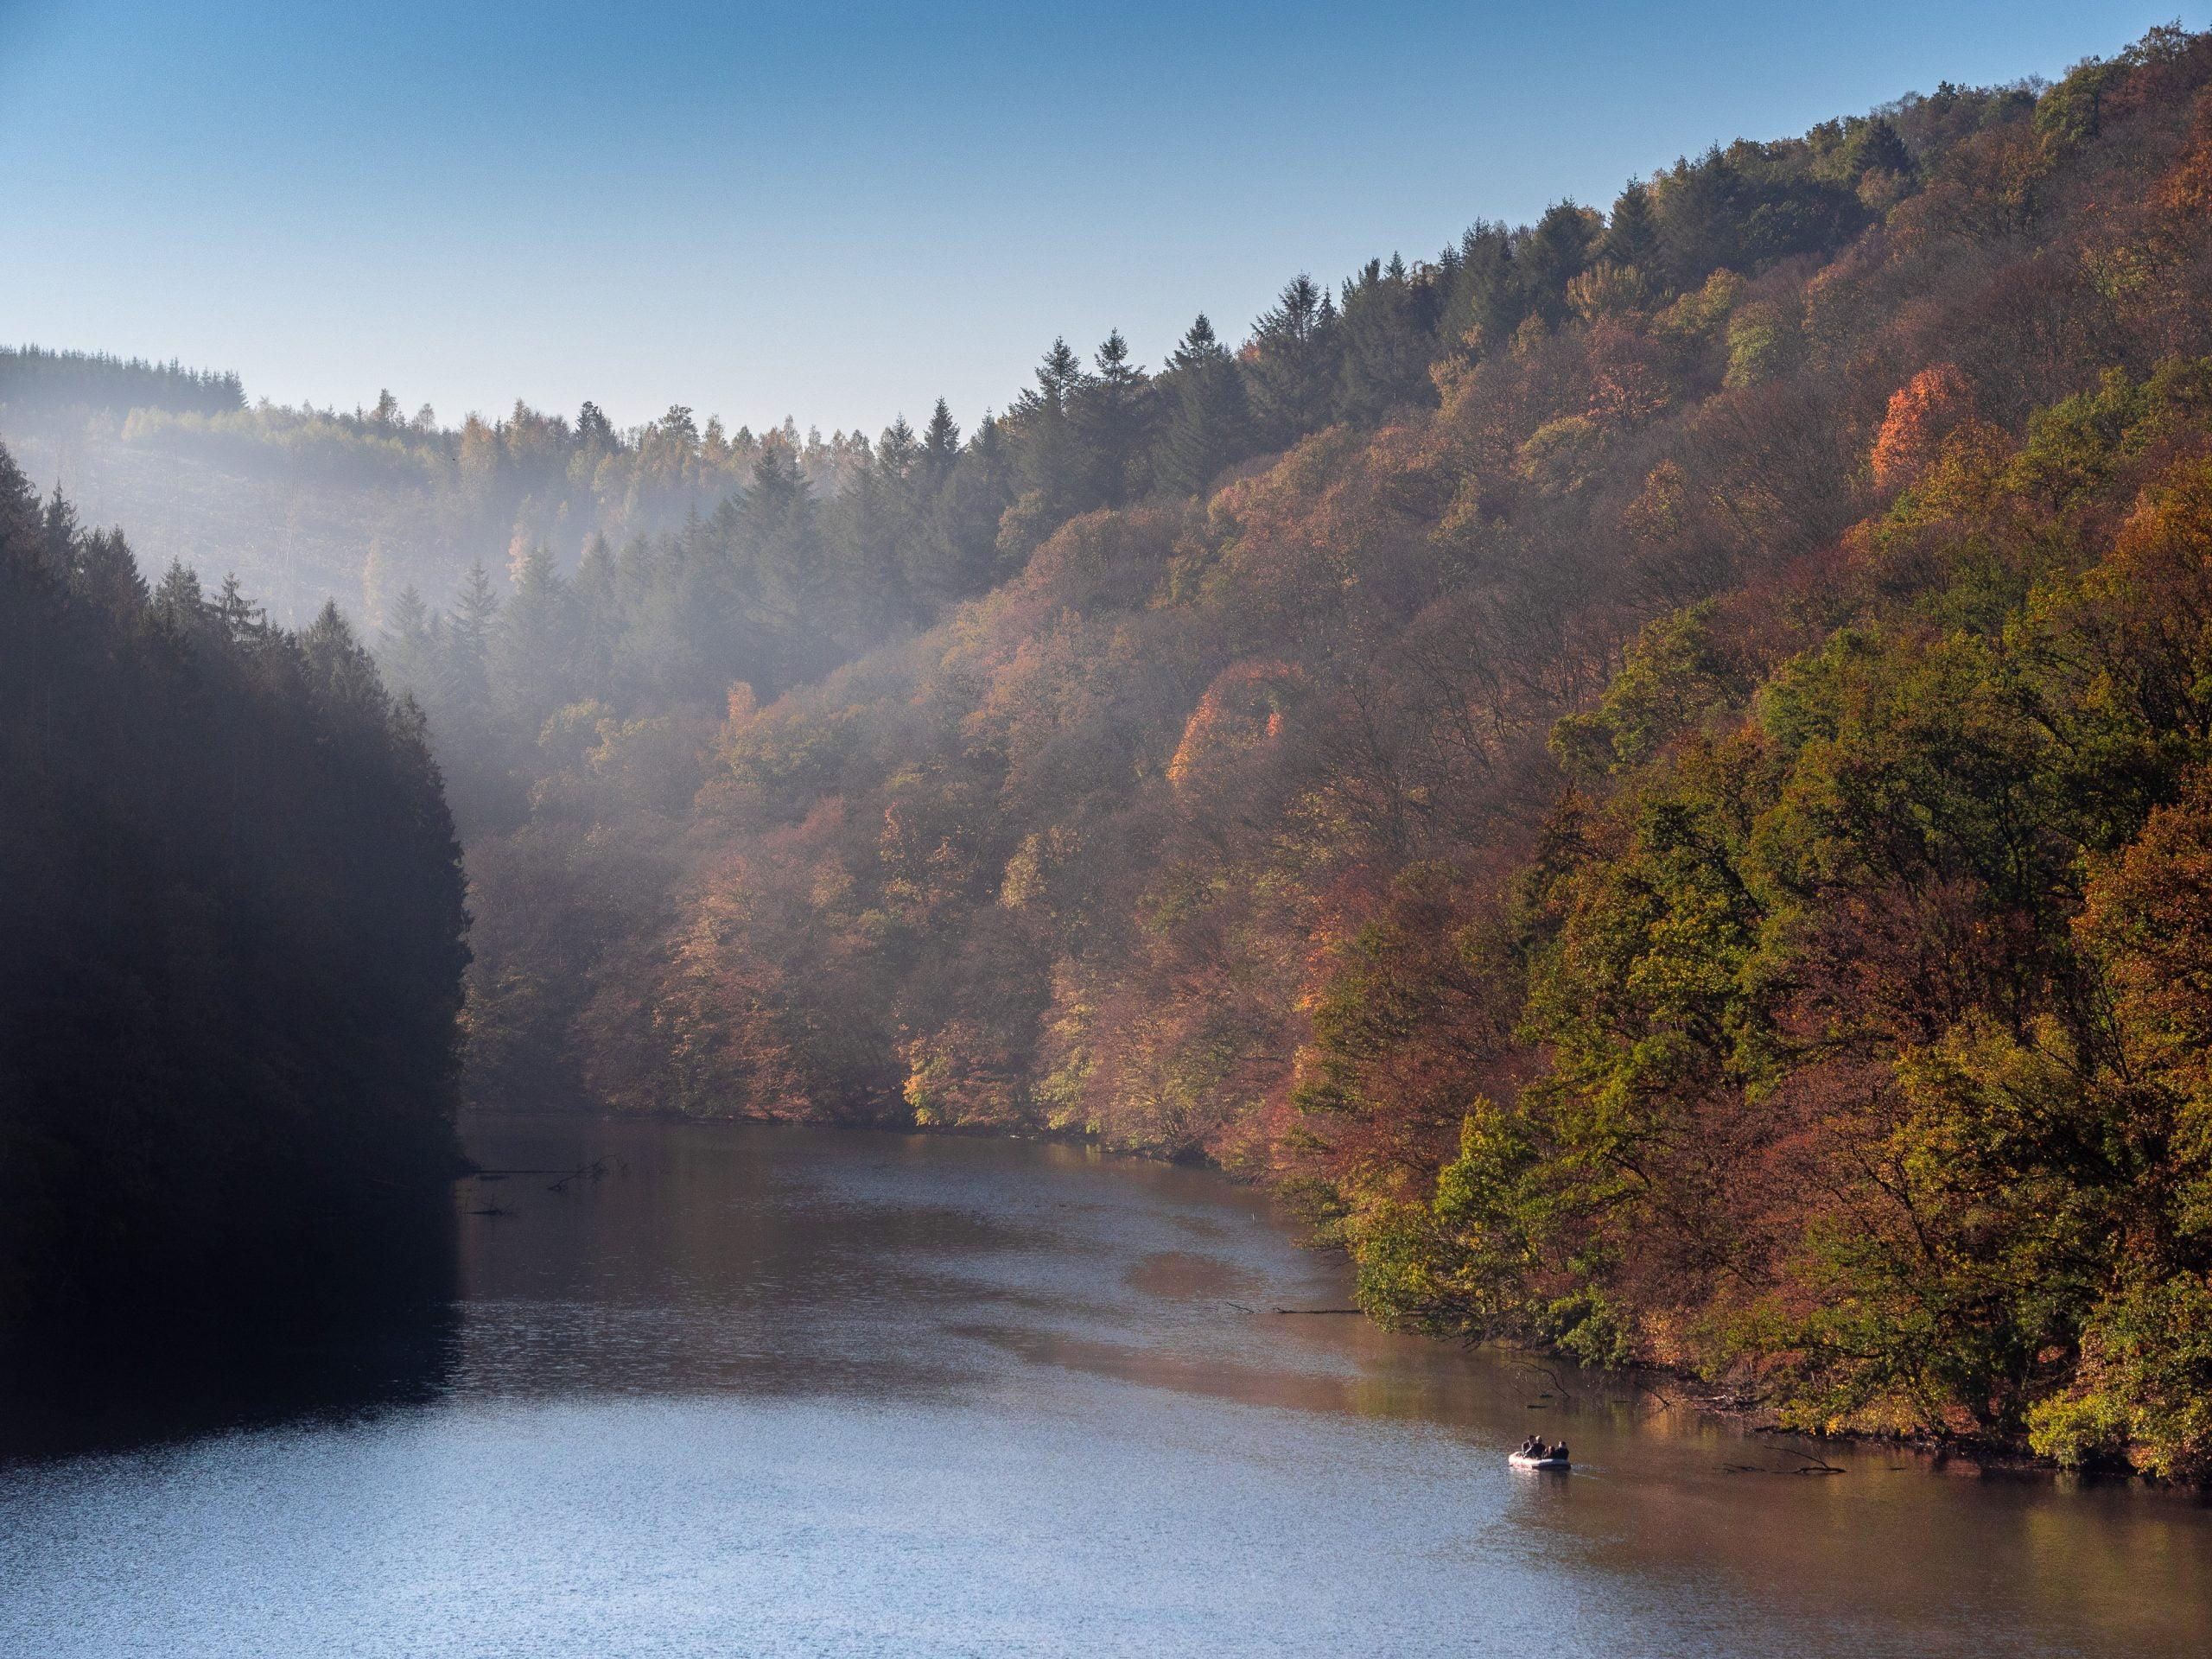 nisramont automne scaled - Les globe blogueurs - blog voyage nature